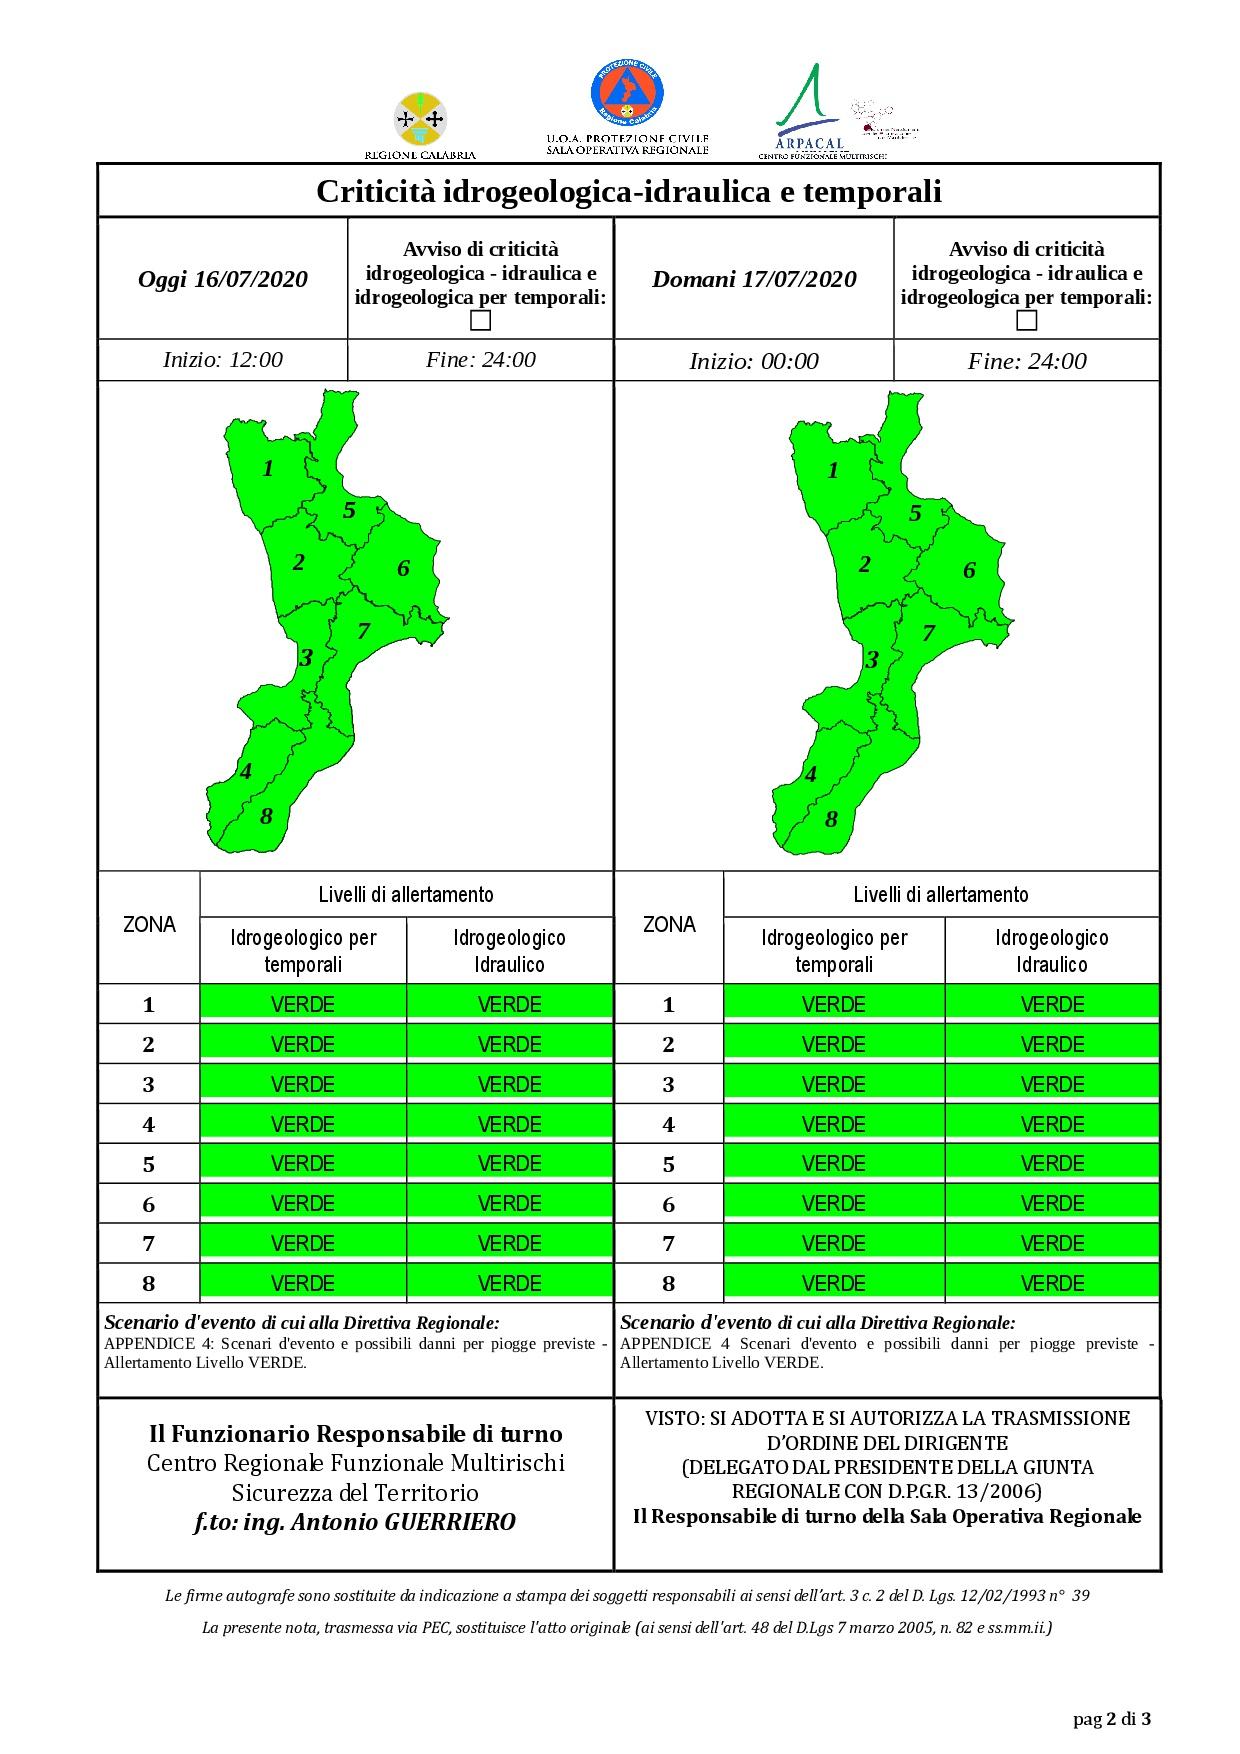 Criticità idrogeologica-idraulica e temporali in Calabria 16-07-2020